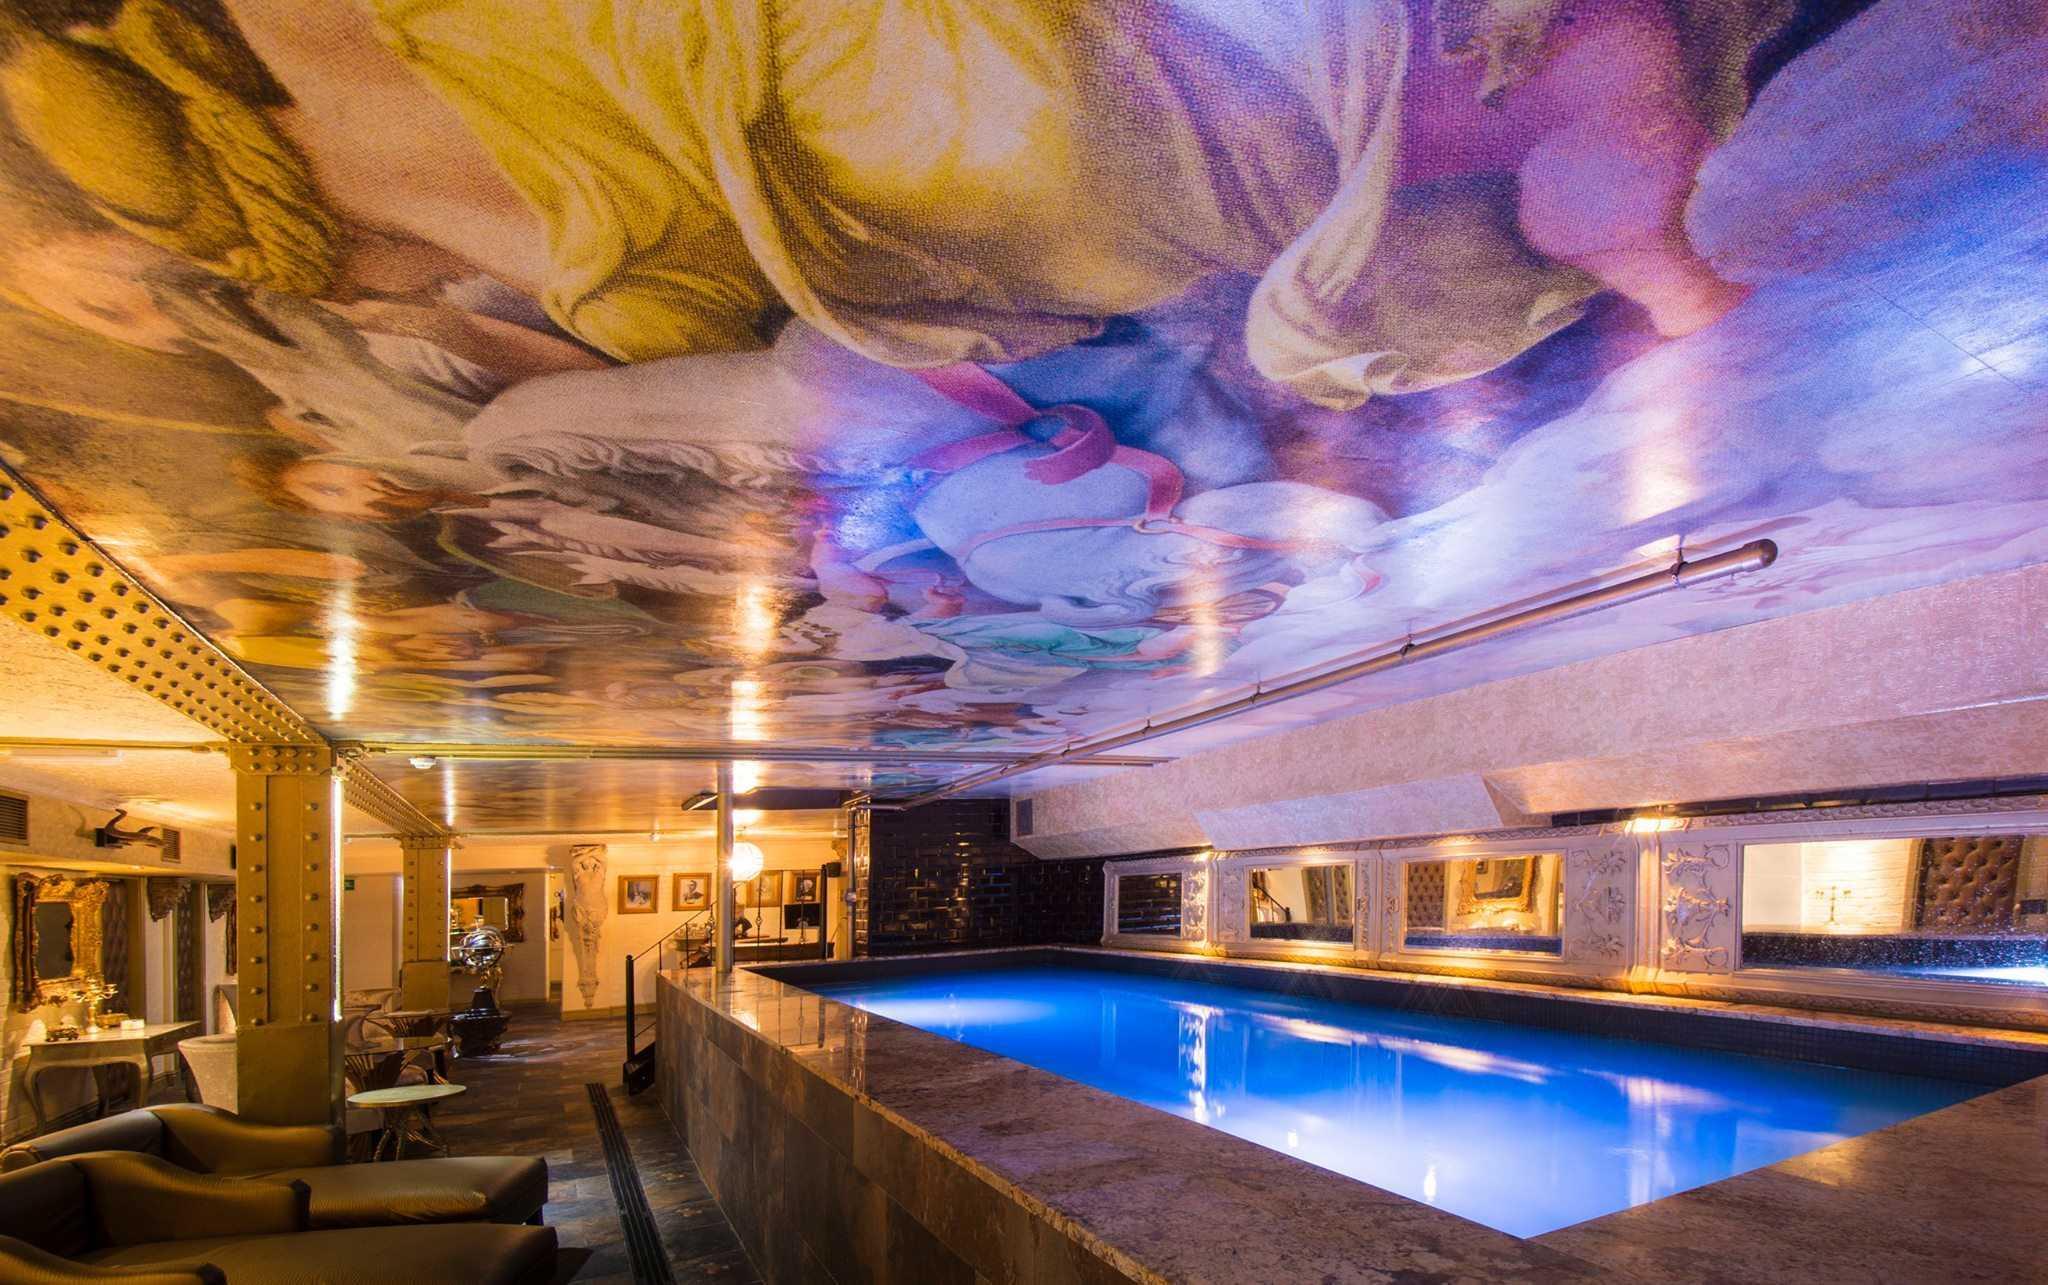 Morgan's Spa - Liverpool pool party hotel room